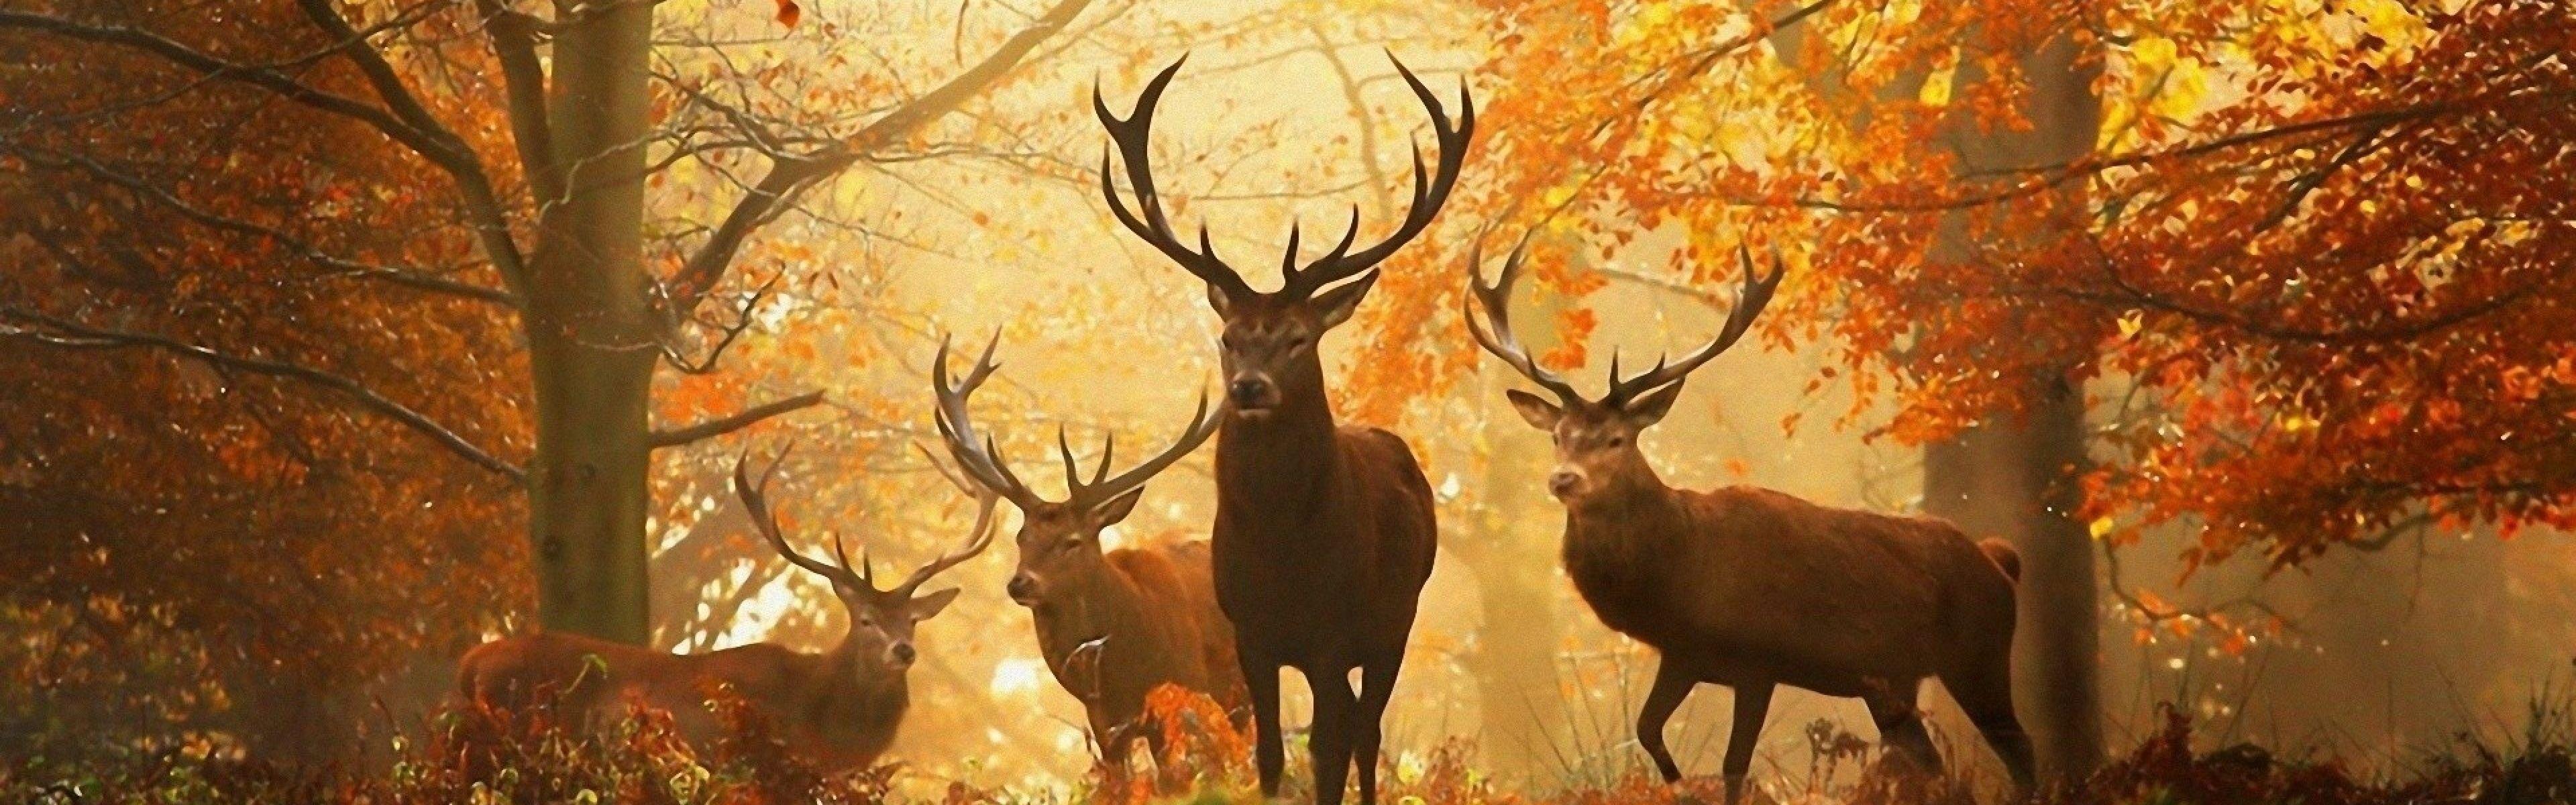 Deer Wallpapers Best Inspirational High Quality Deer